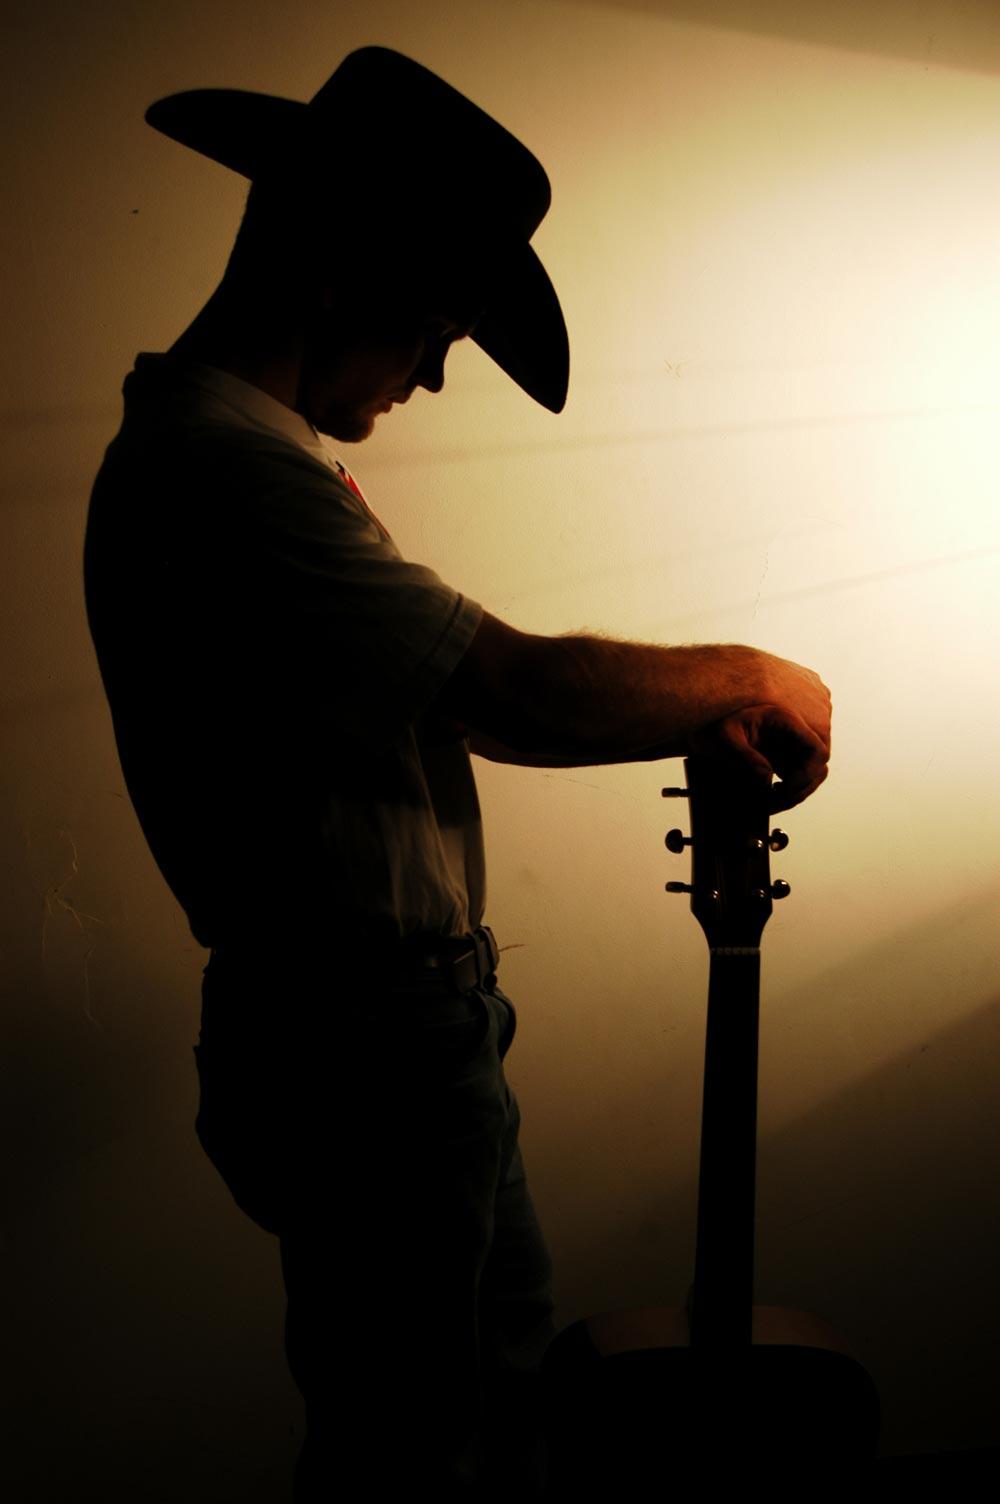 Sad_Cowboy__by_redneckbond